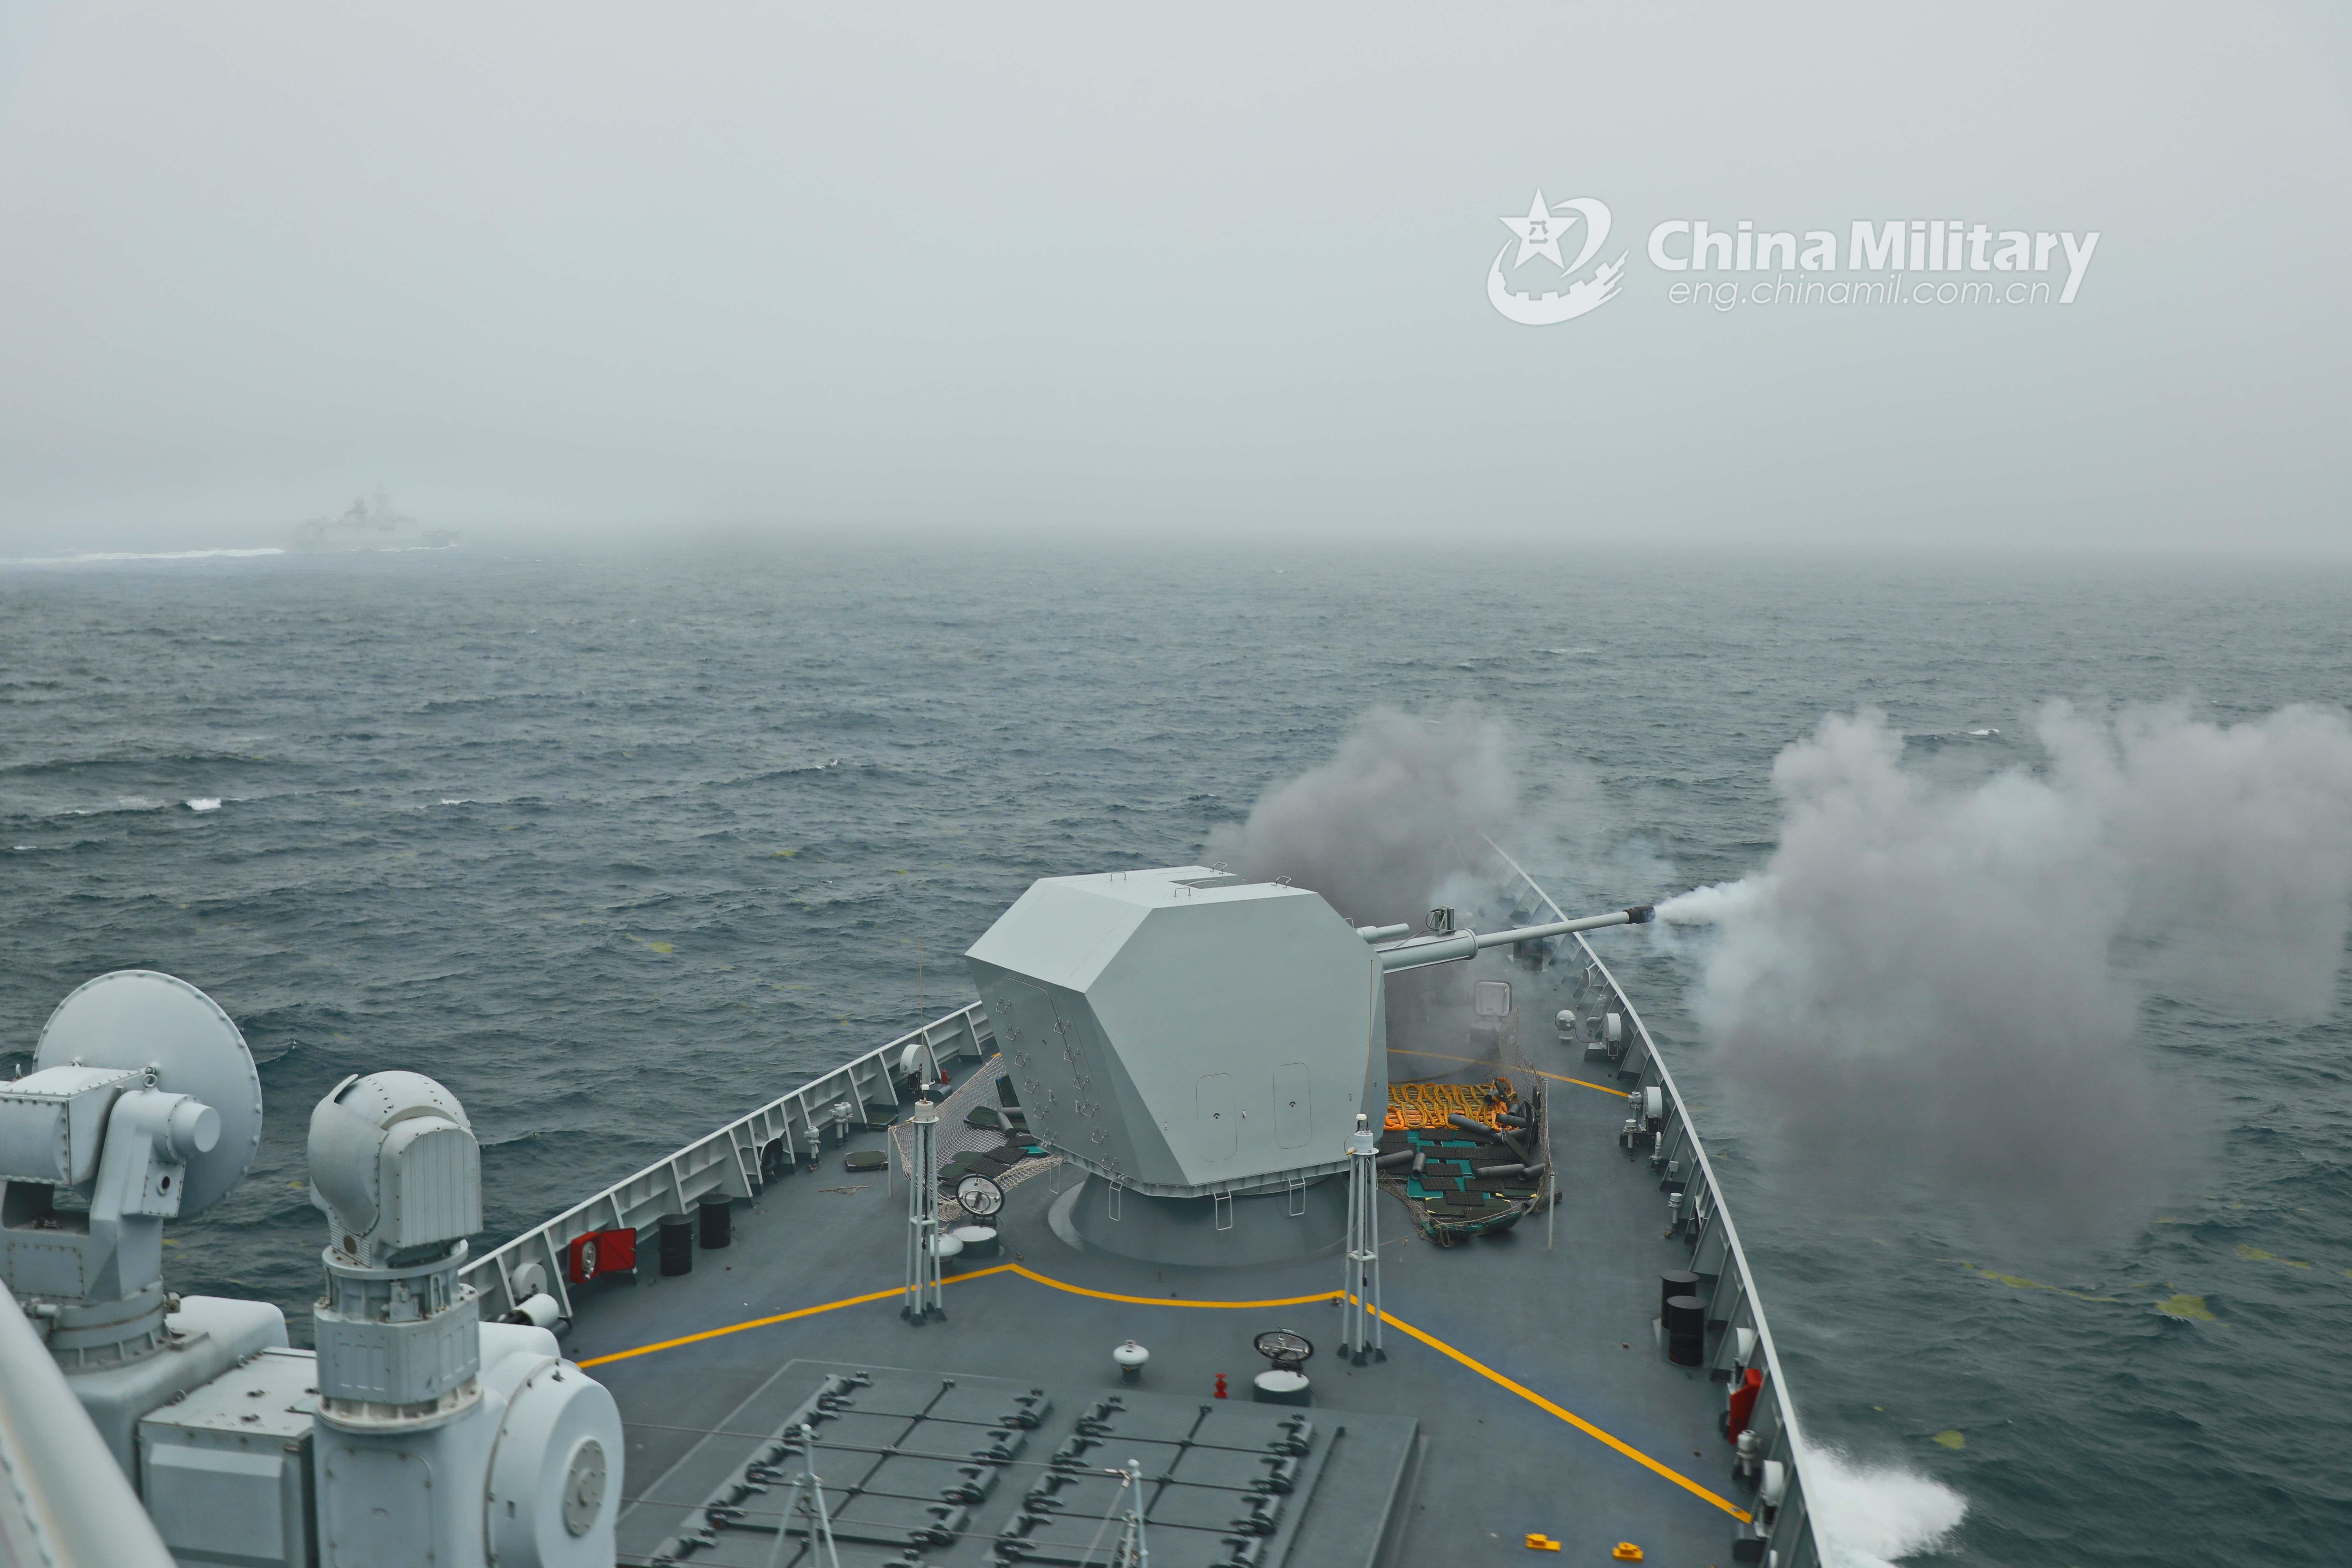 Frigate Yantai fires jamming bombs in Yellow Sea